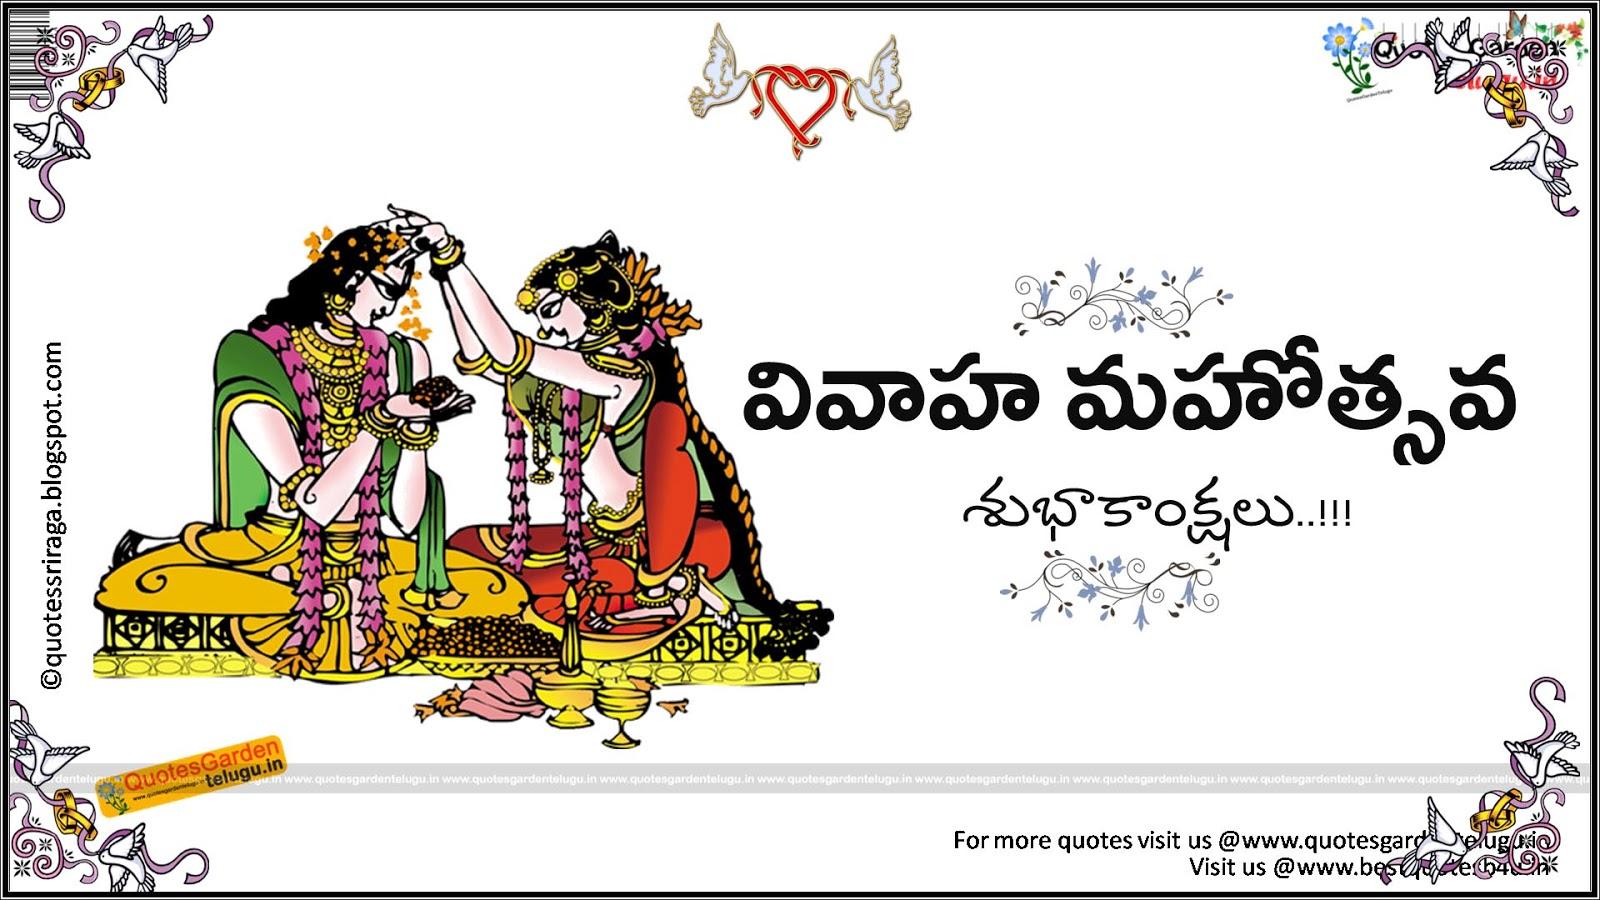 Marriage day greetings in telugu | QUOTES GARDEN TELUGU ...